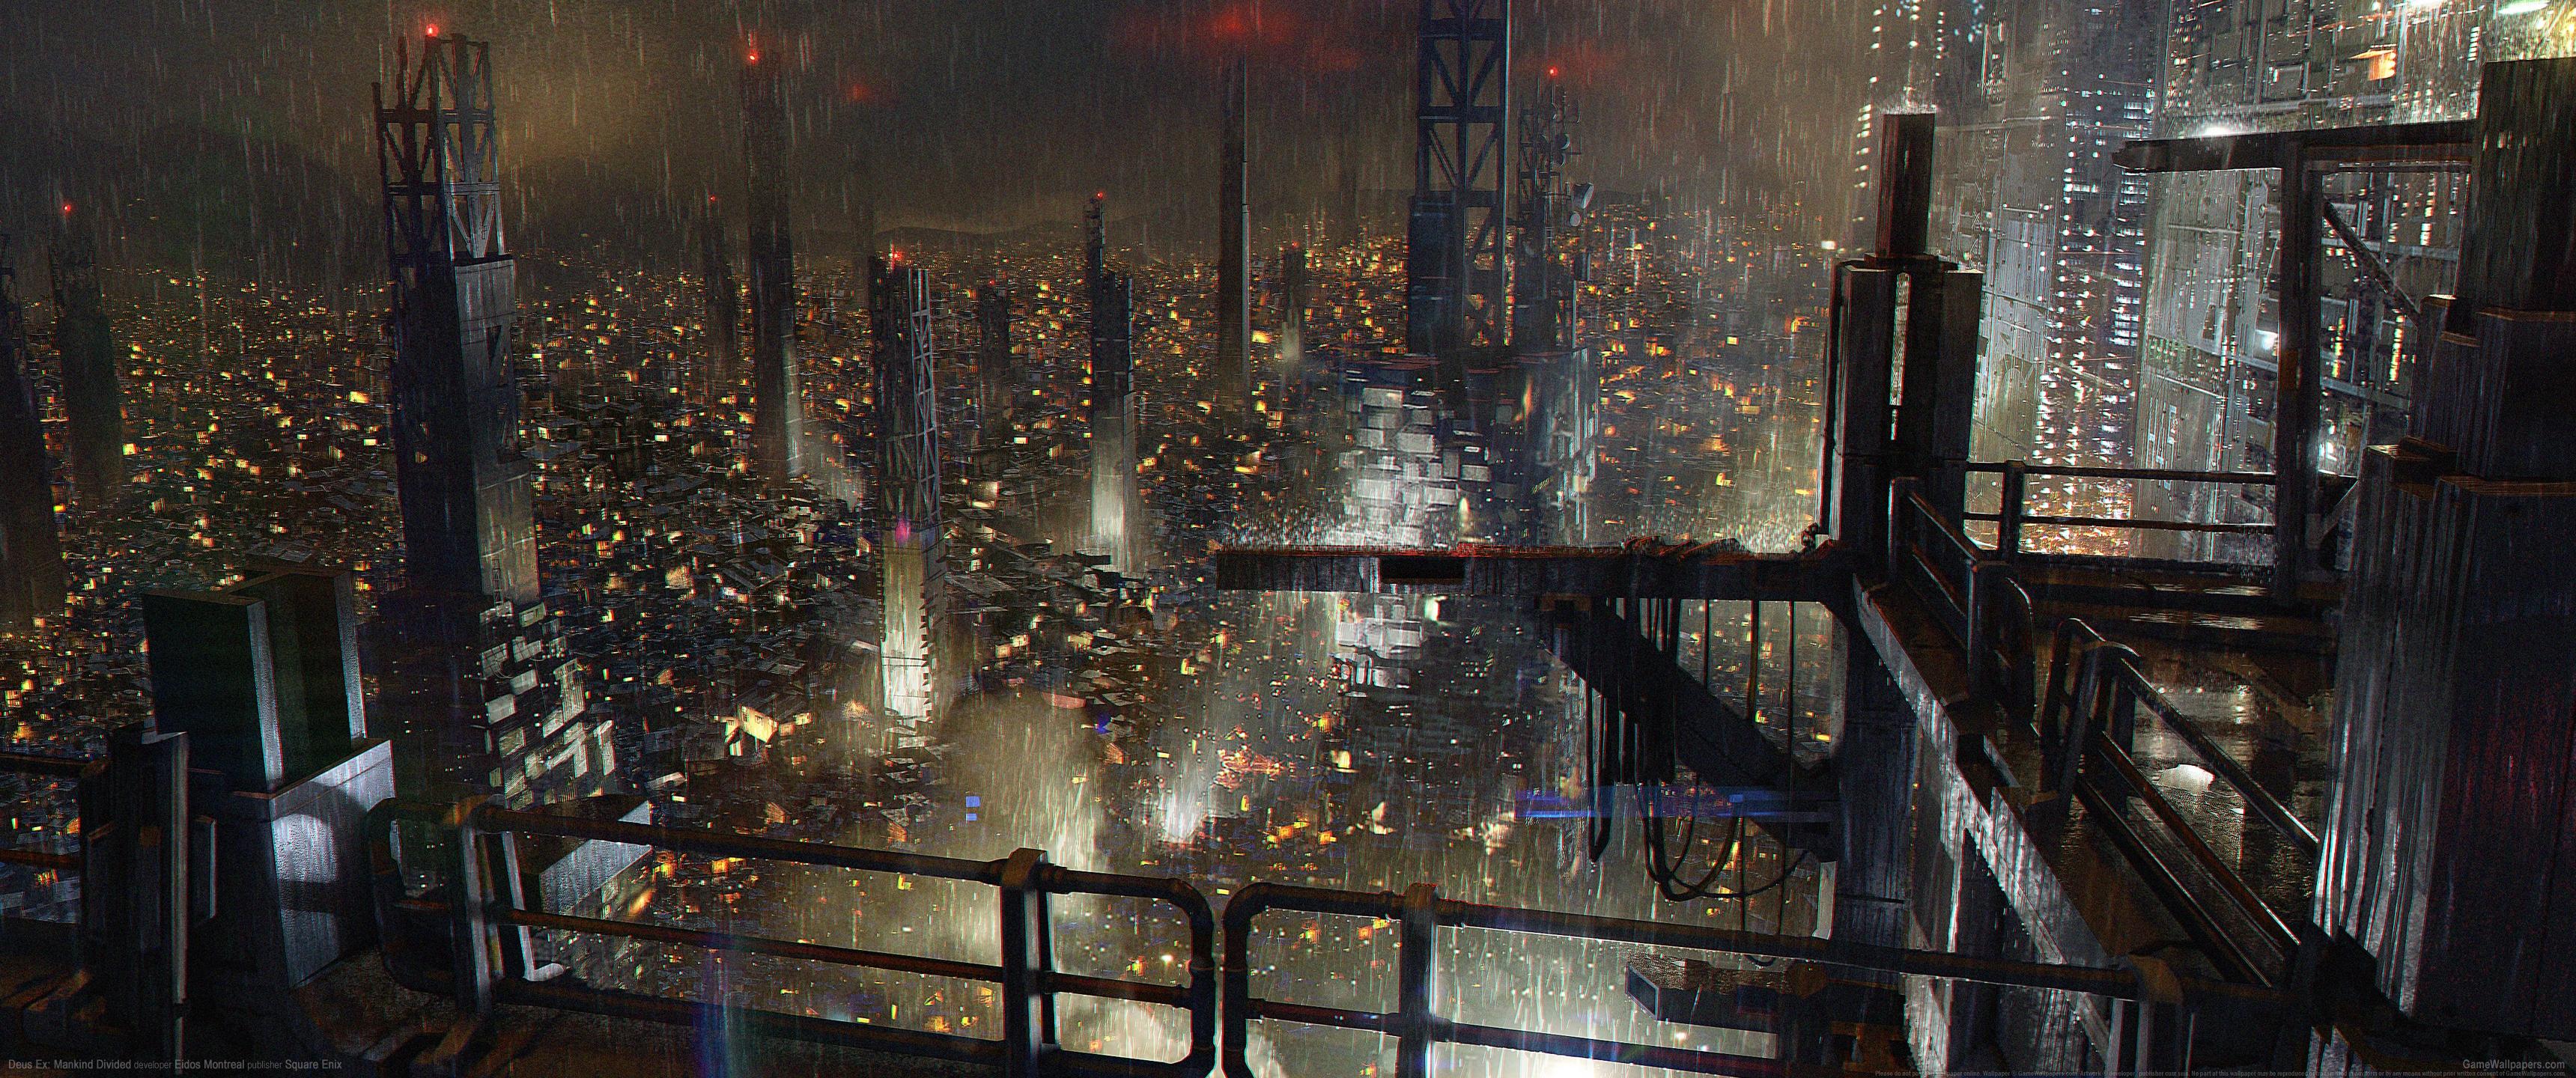 General 3440x1440 video games ultrawide ultra-wide Deus Ex: Mankind Divided cyberpunk video game art Deus Ex